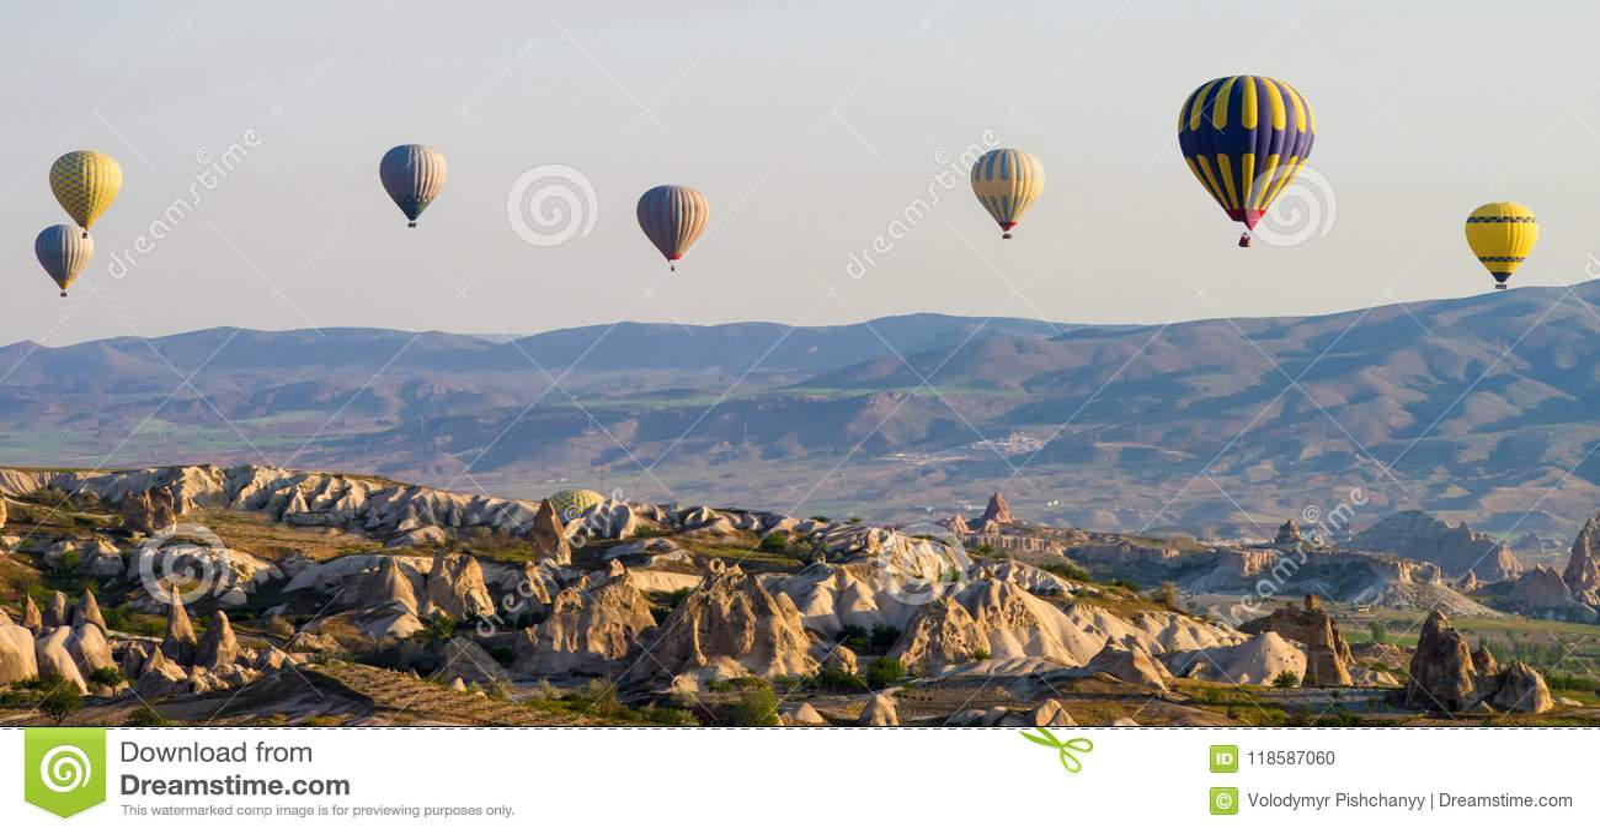 Hot air balloons at sunrise flying over Cappadocia, Turkey